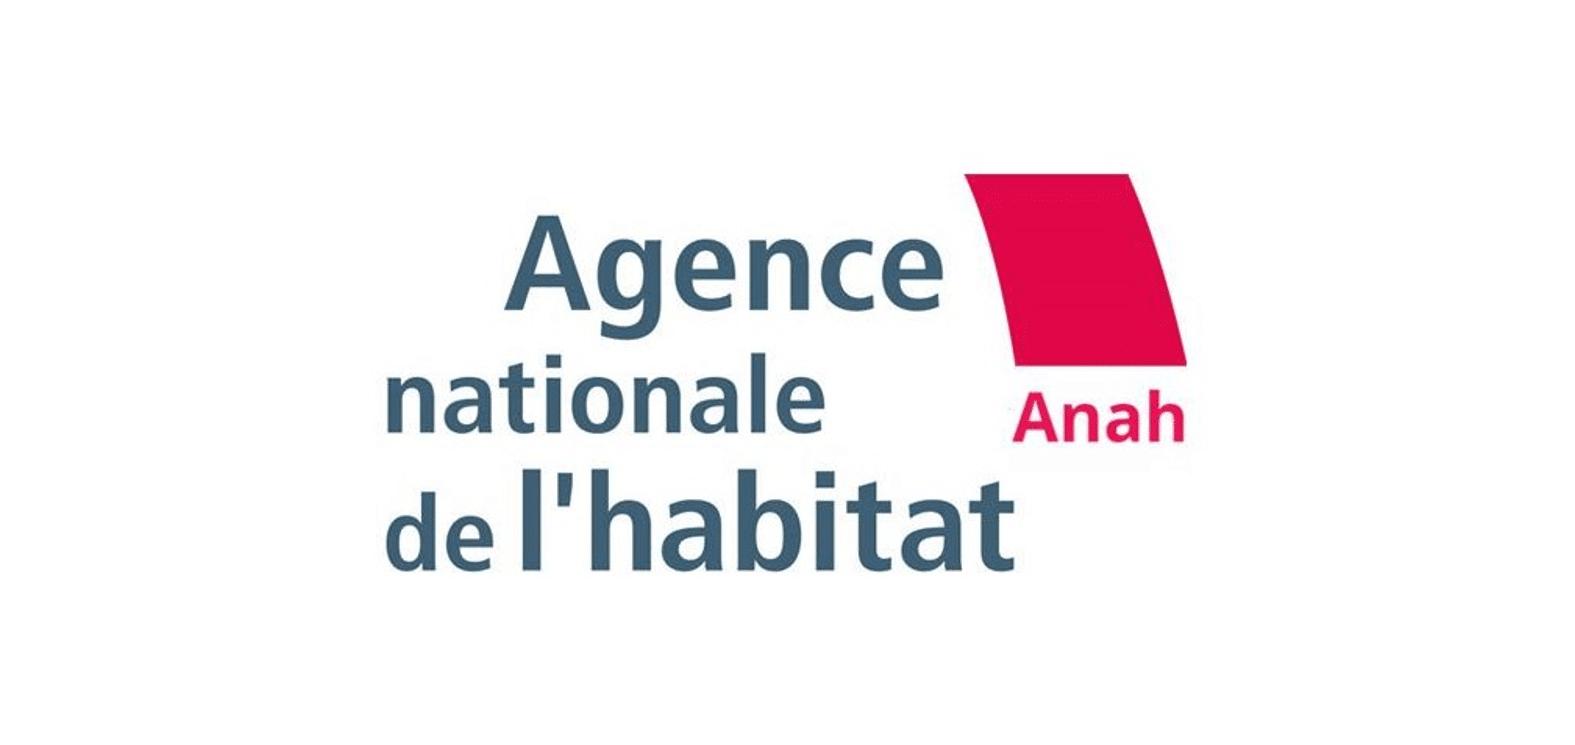 agence-nationale-de-habitat-03052019-1748